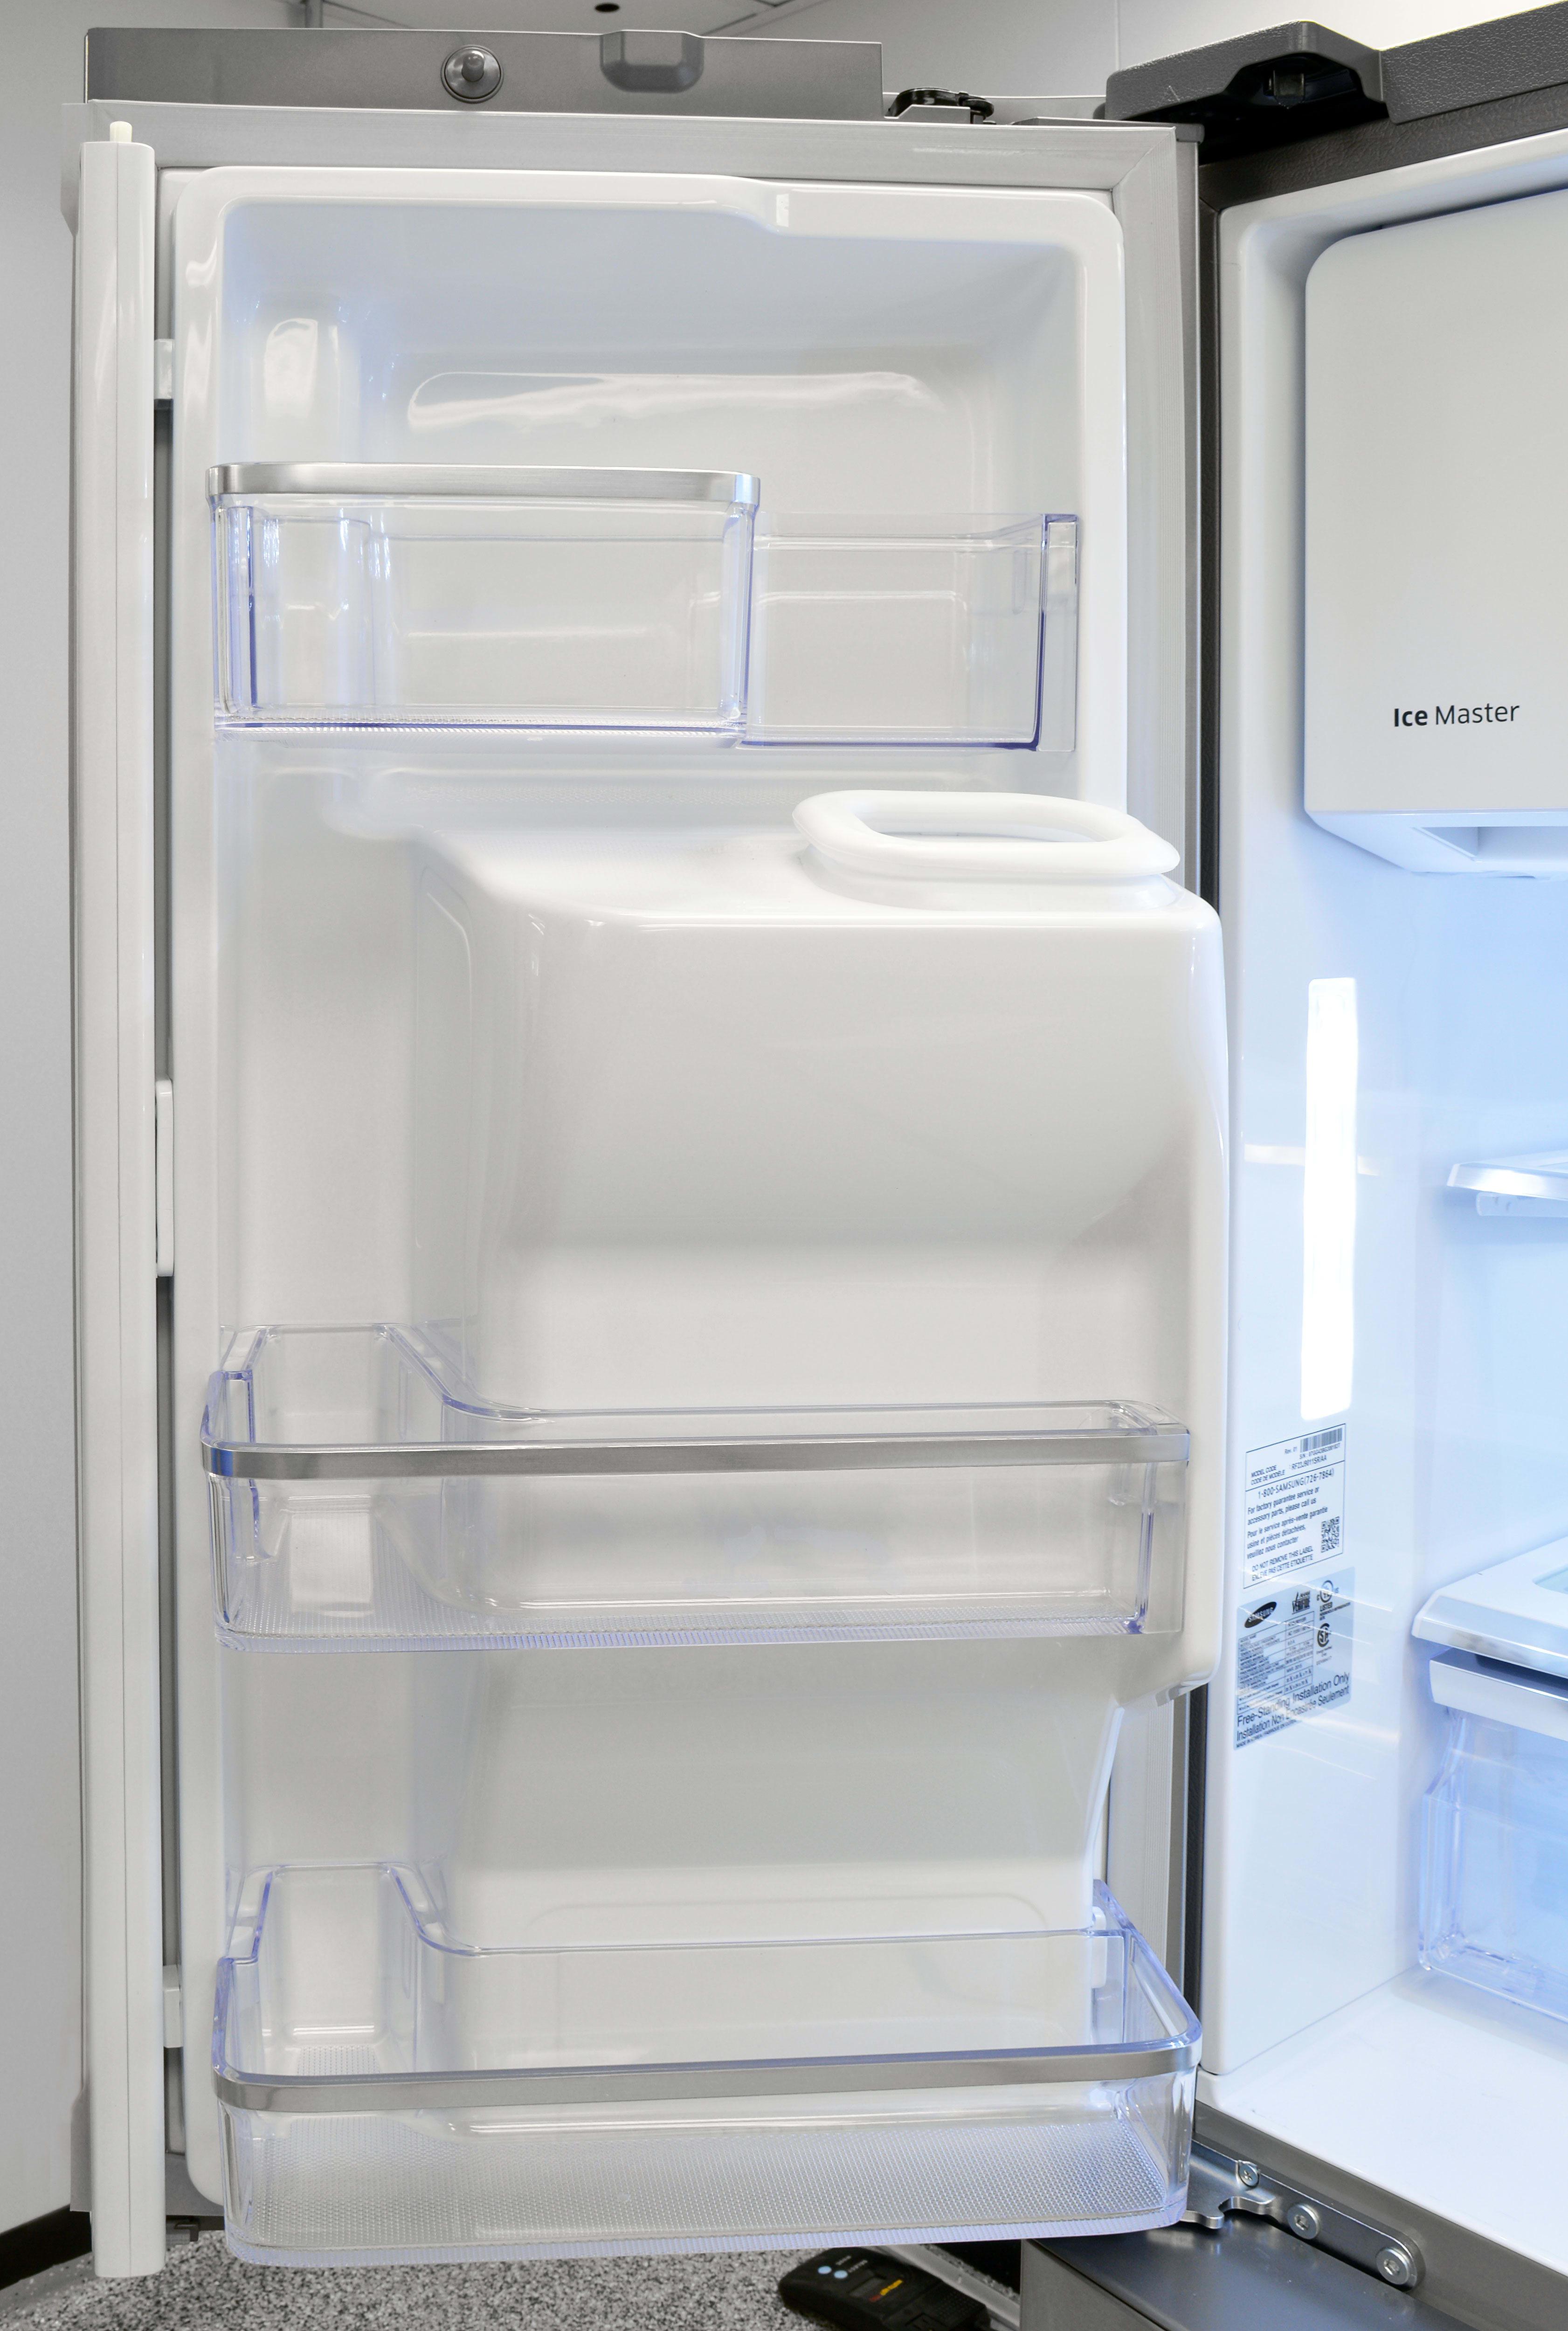 The Samsung RF23J9011SR's left door plays host to the icemaker's dispenser chute.